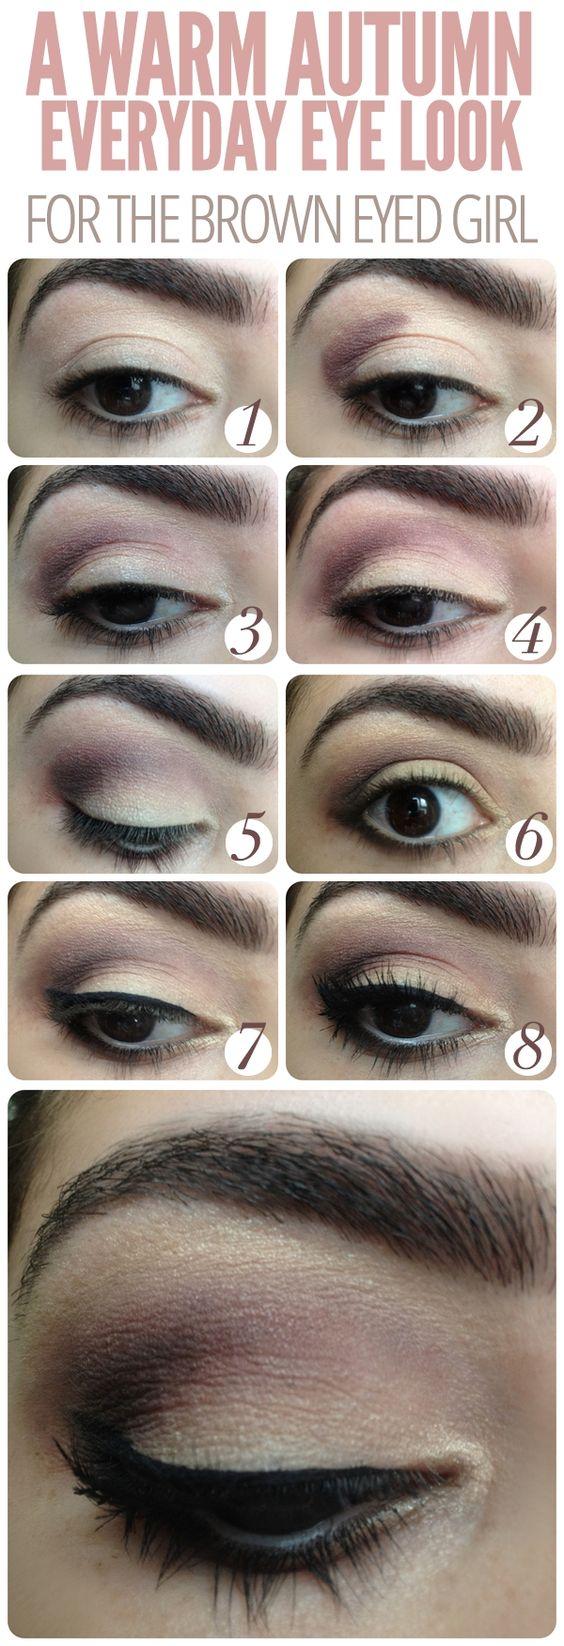 Everyday Fall Smokey Eye For The Dark, Browneyed Gal Everyday Fall Smokey  Eye For The Step 1 Apply A Shimmery Eyeshadow